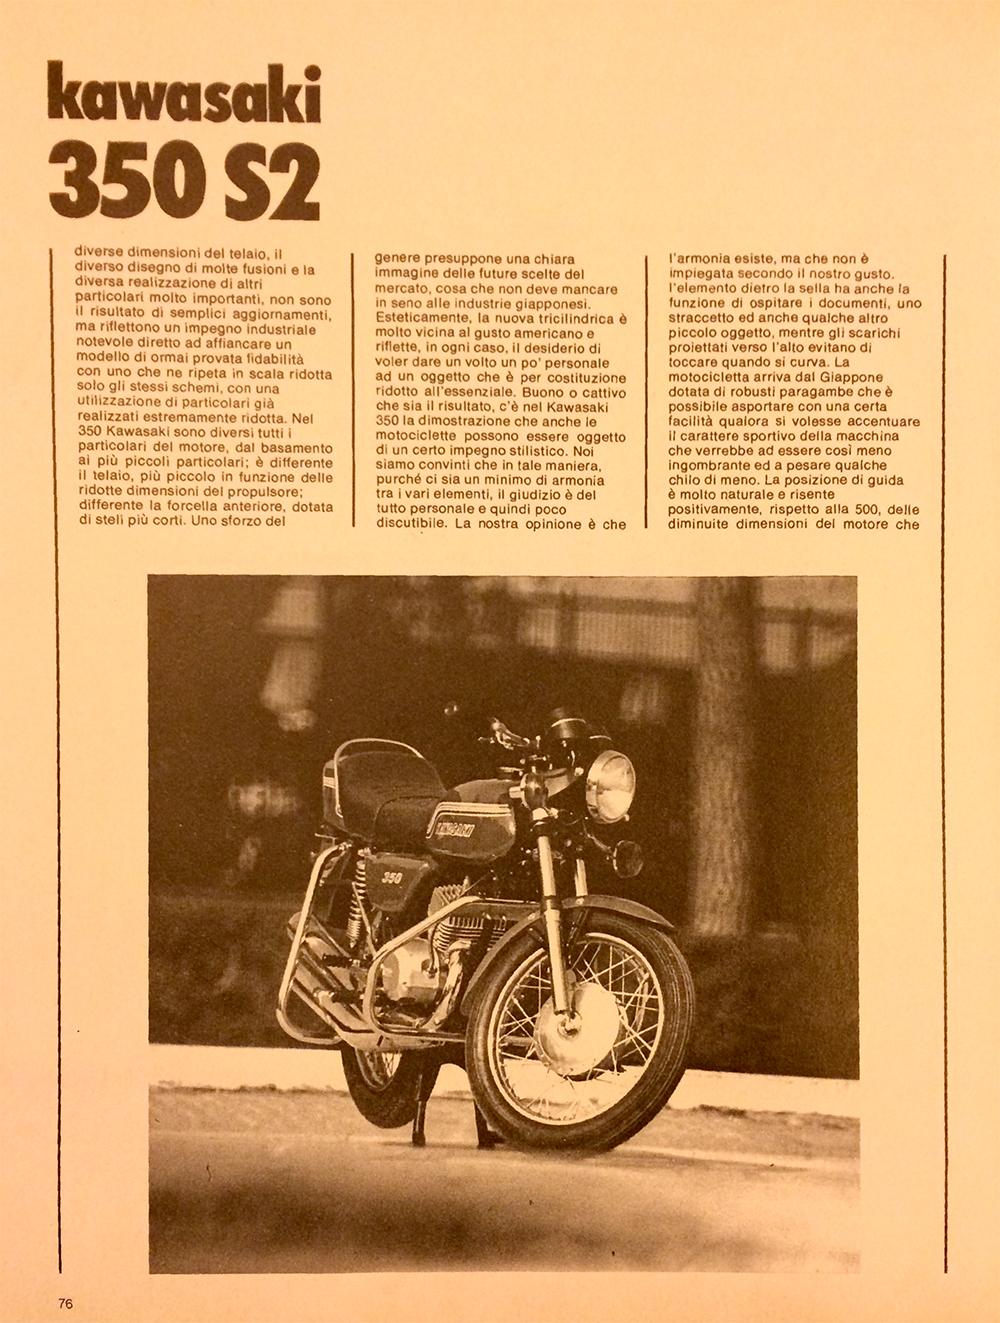 1971 Kawasaki 350 S2 Italy road test 04.jpg